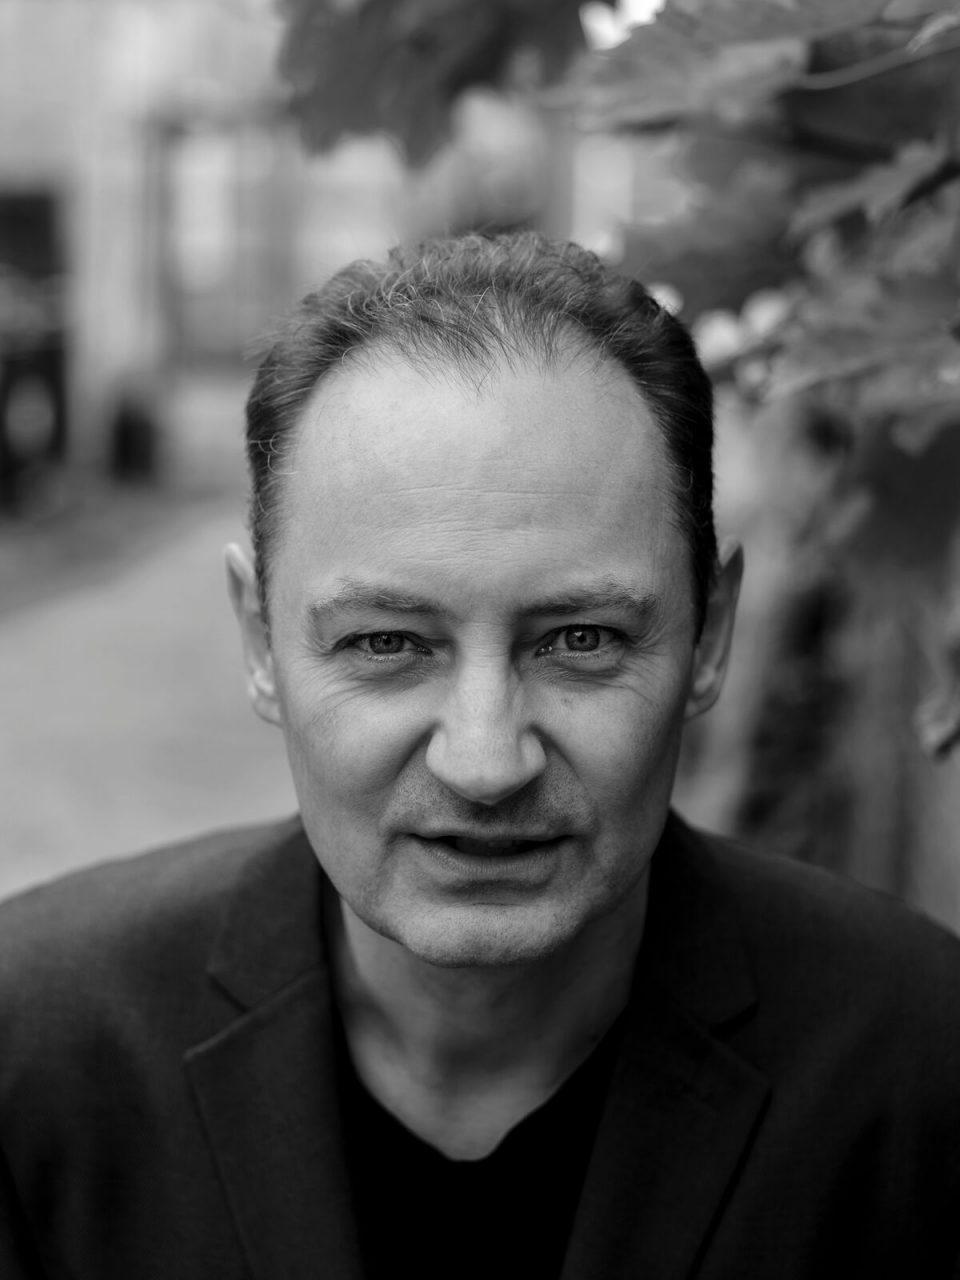 Carsten René Nielsen, enogfyrre ting, 41 ting, prosadigte